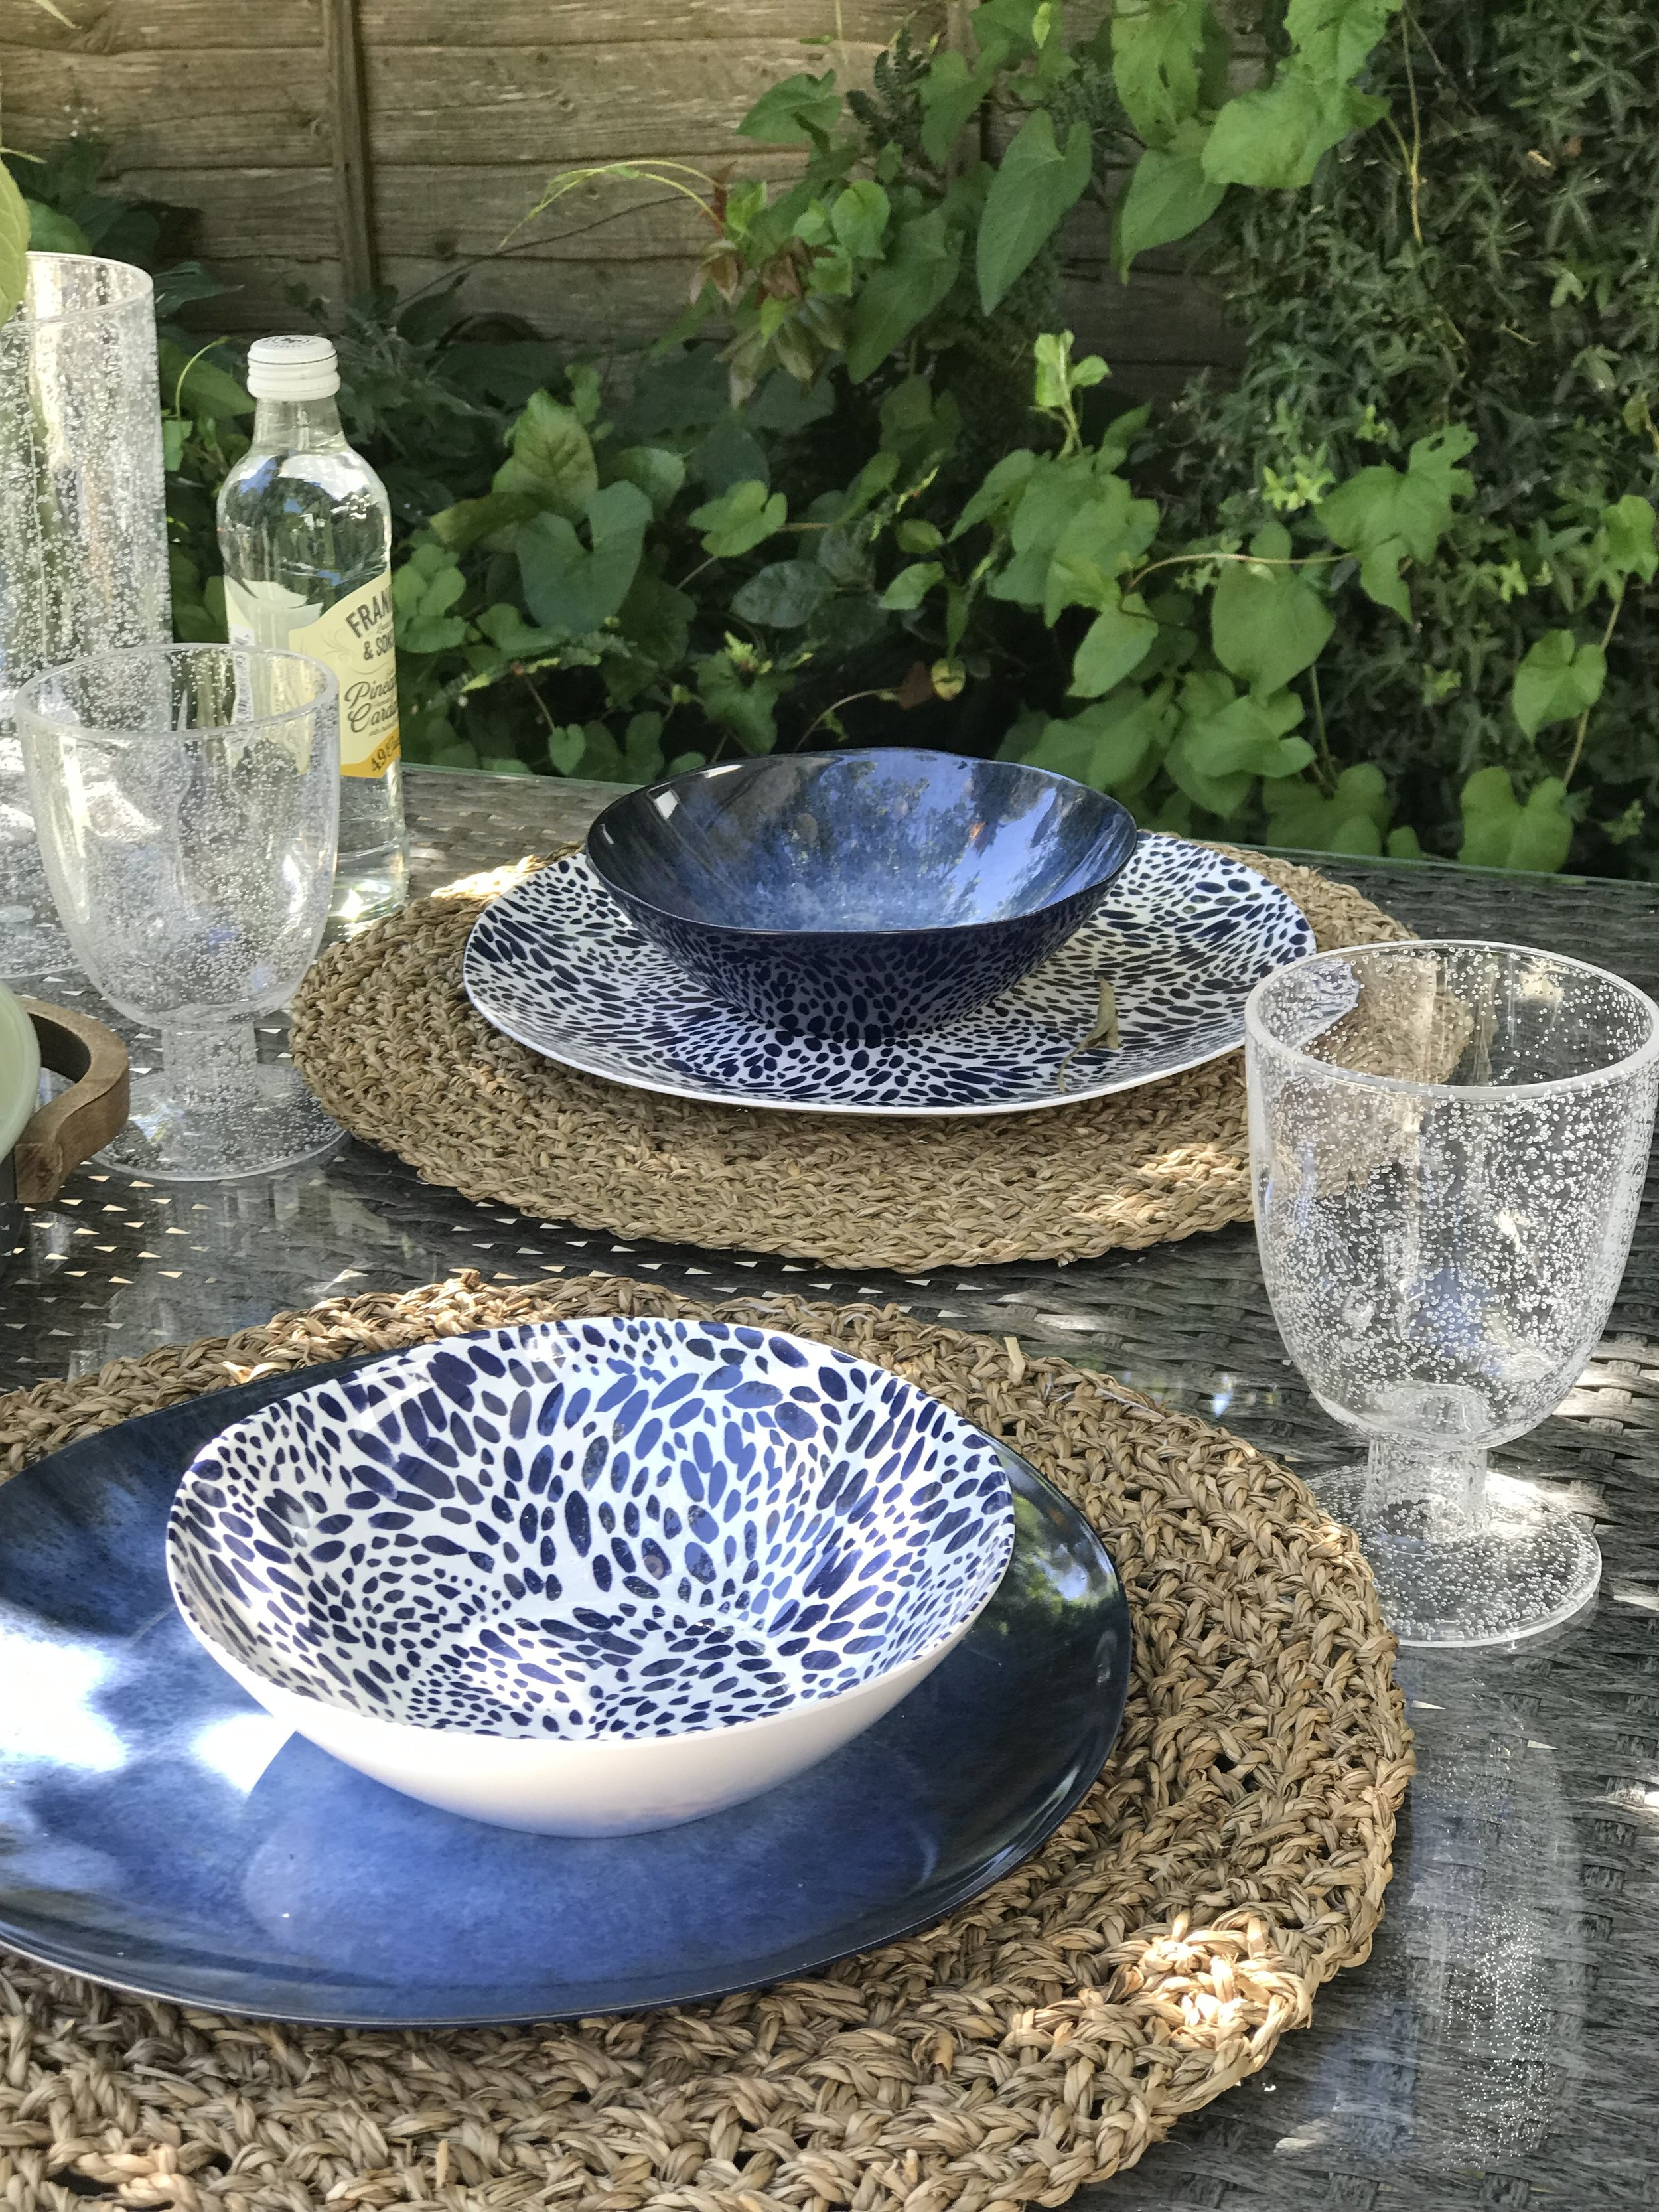 Coastline melamine bowls